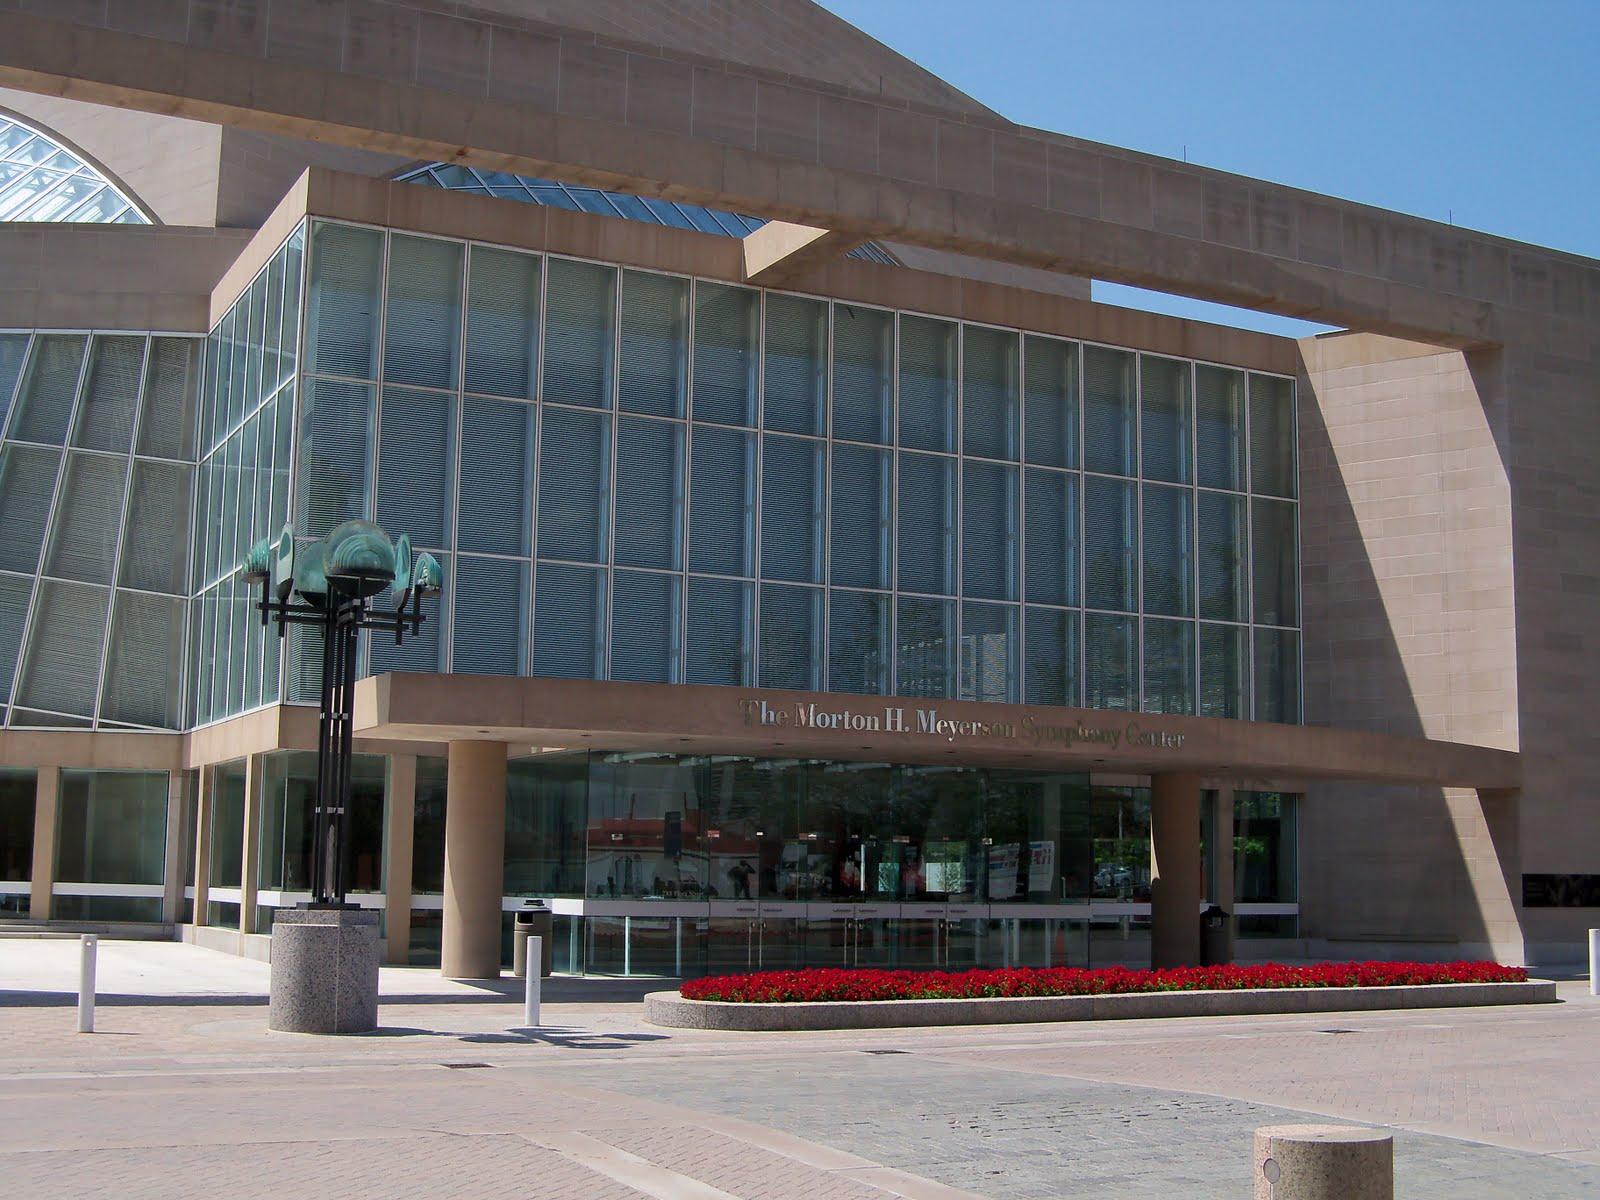 Dallas Fort Worth vacation - 100_9850.JPG